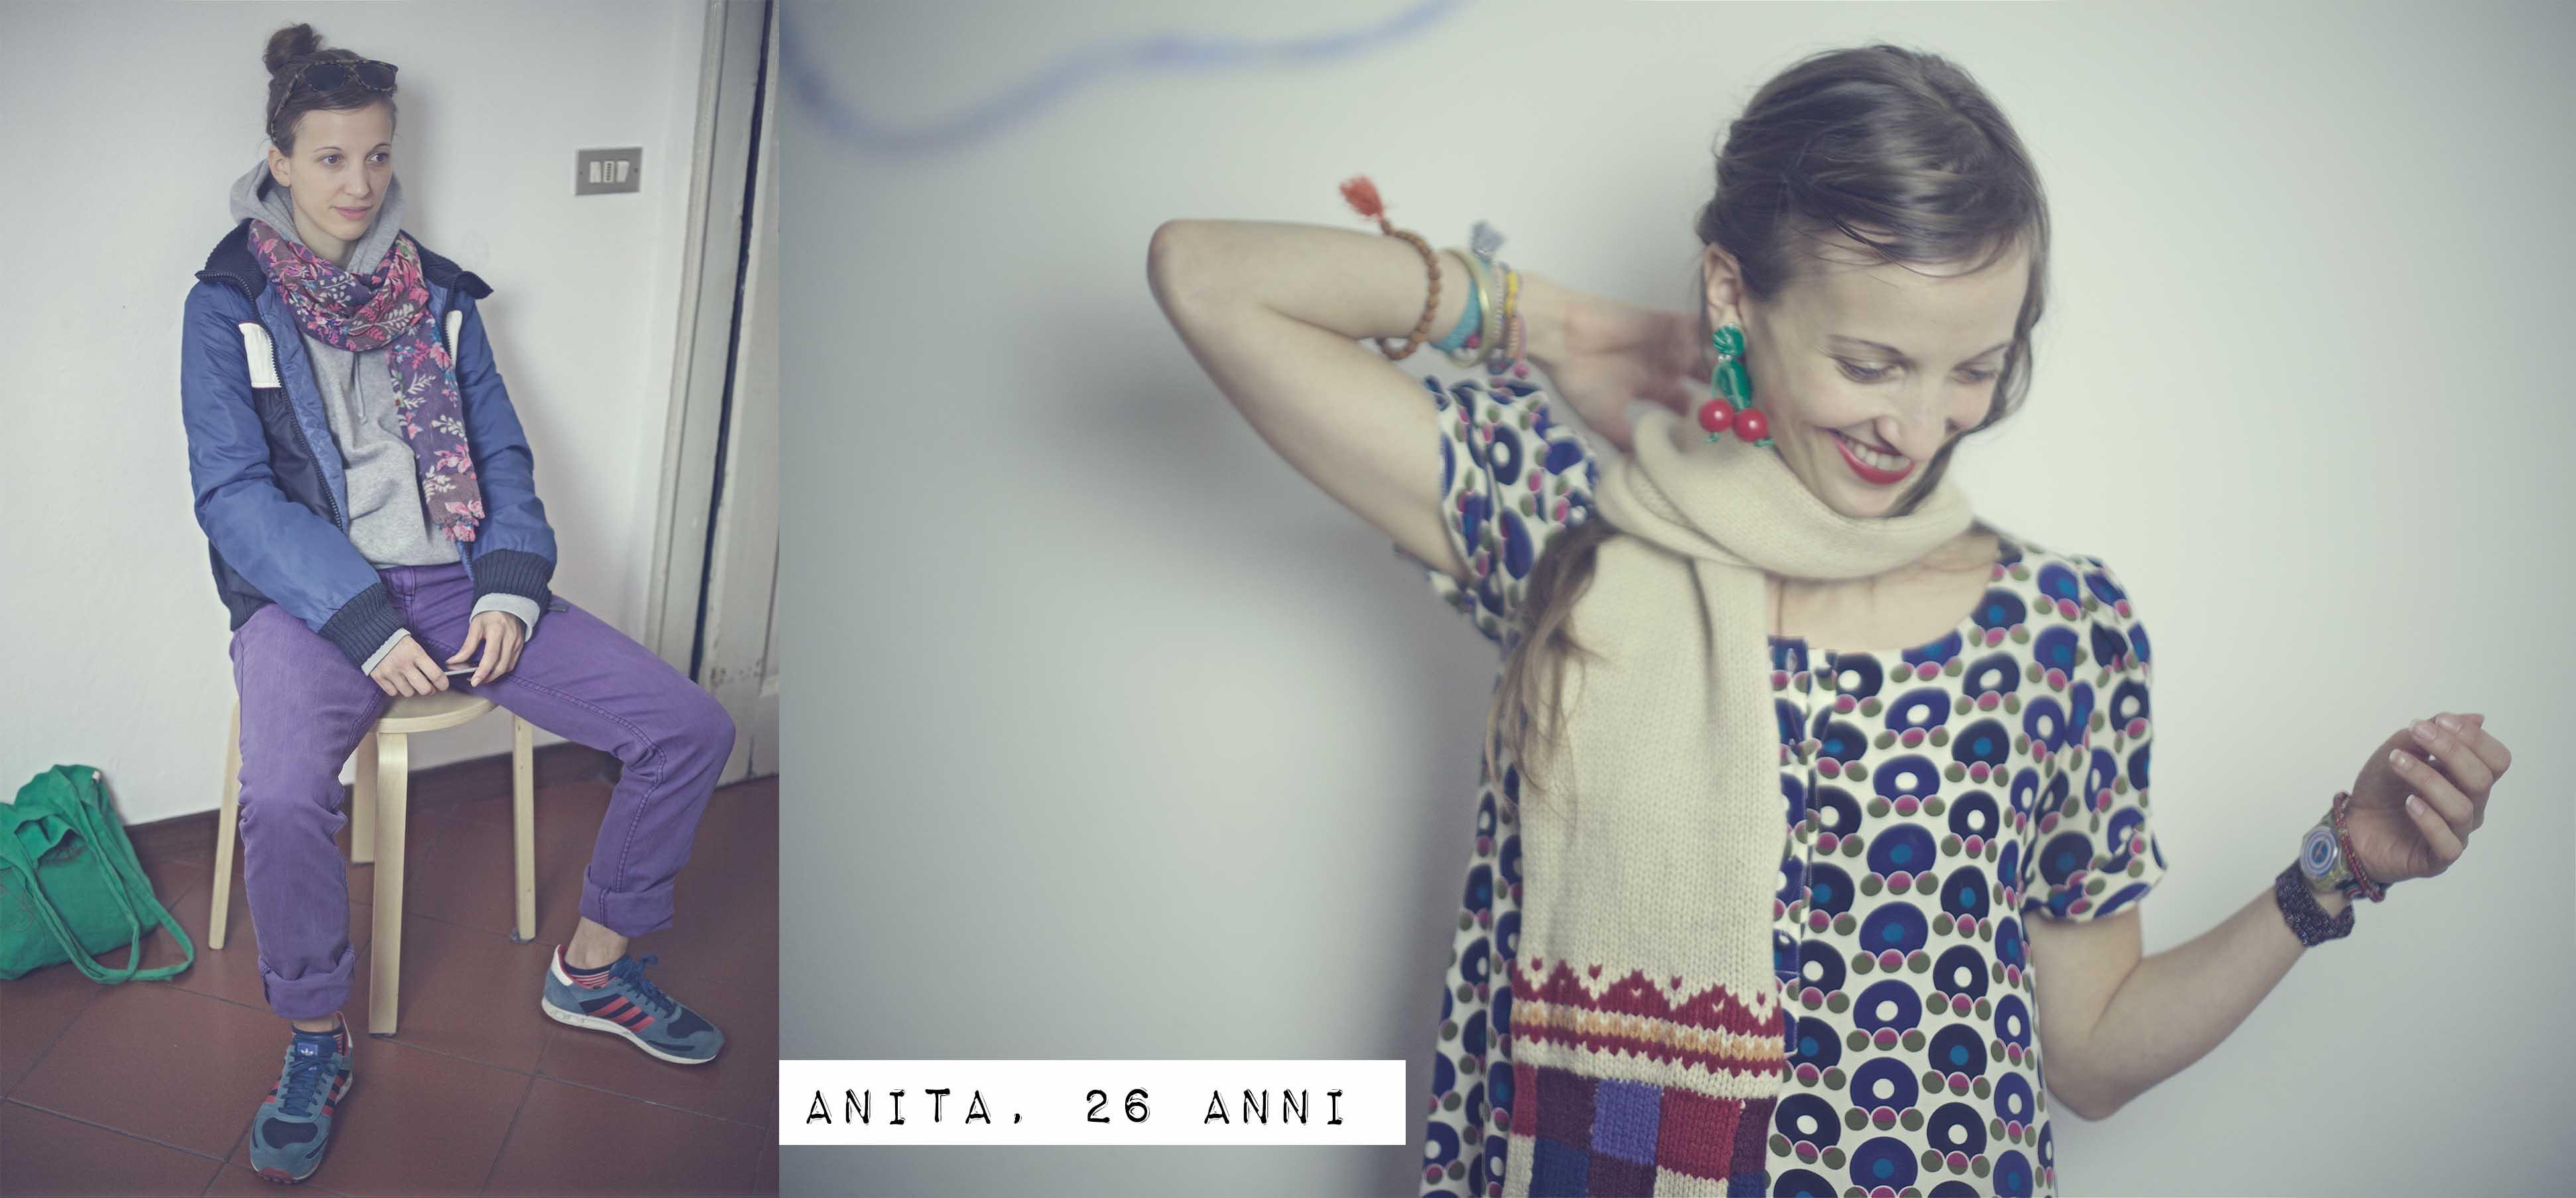 Anita, 26 anni